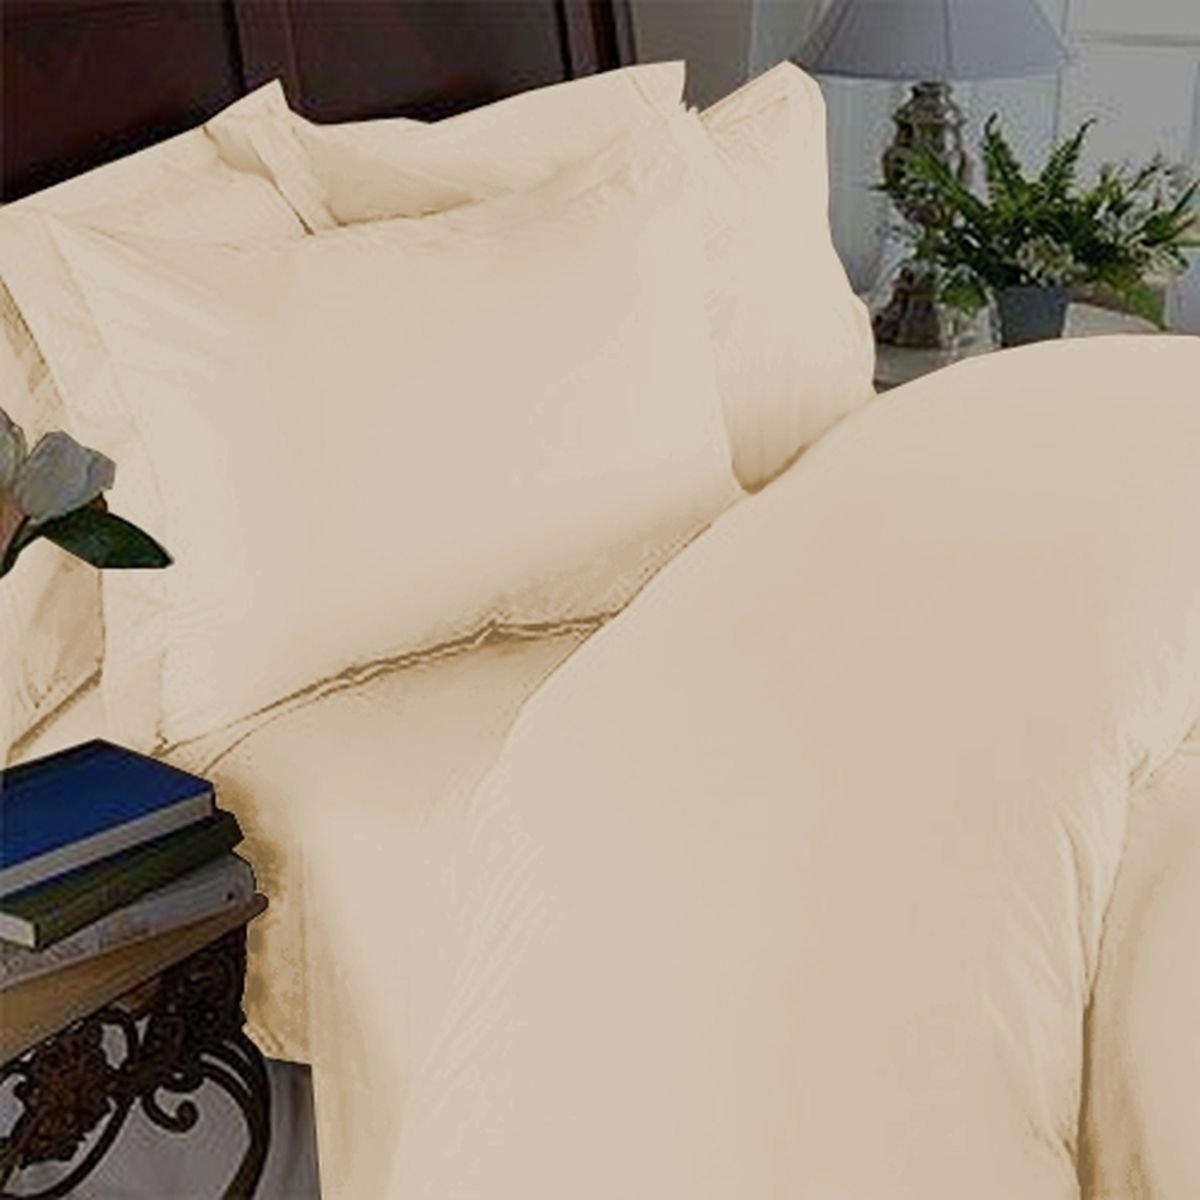 Beige 2RW King Beige Elegant Comfort 4 Piece 1500 Thread Count Luxurious Ultra Soft Egyptian Quality Coziest Sheet Set King